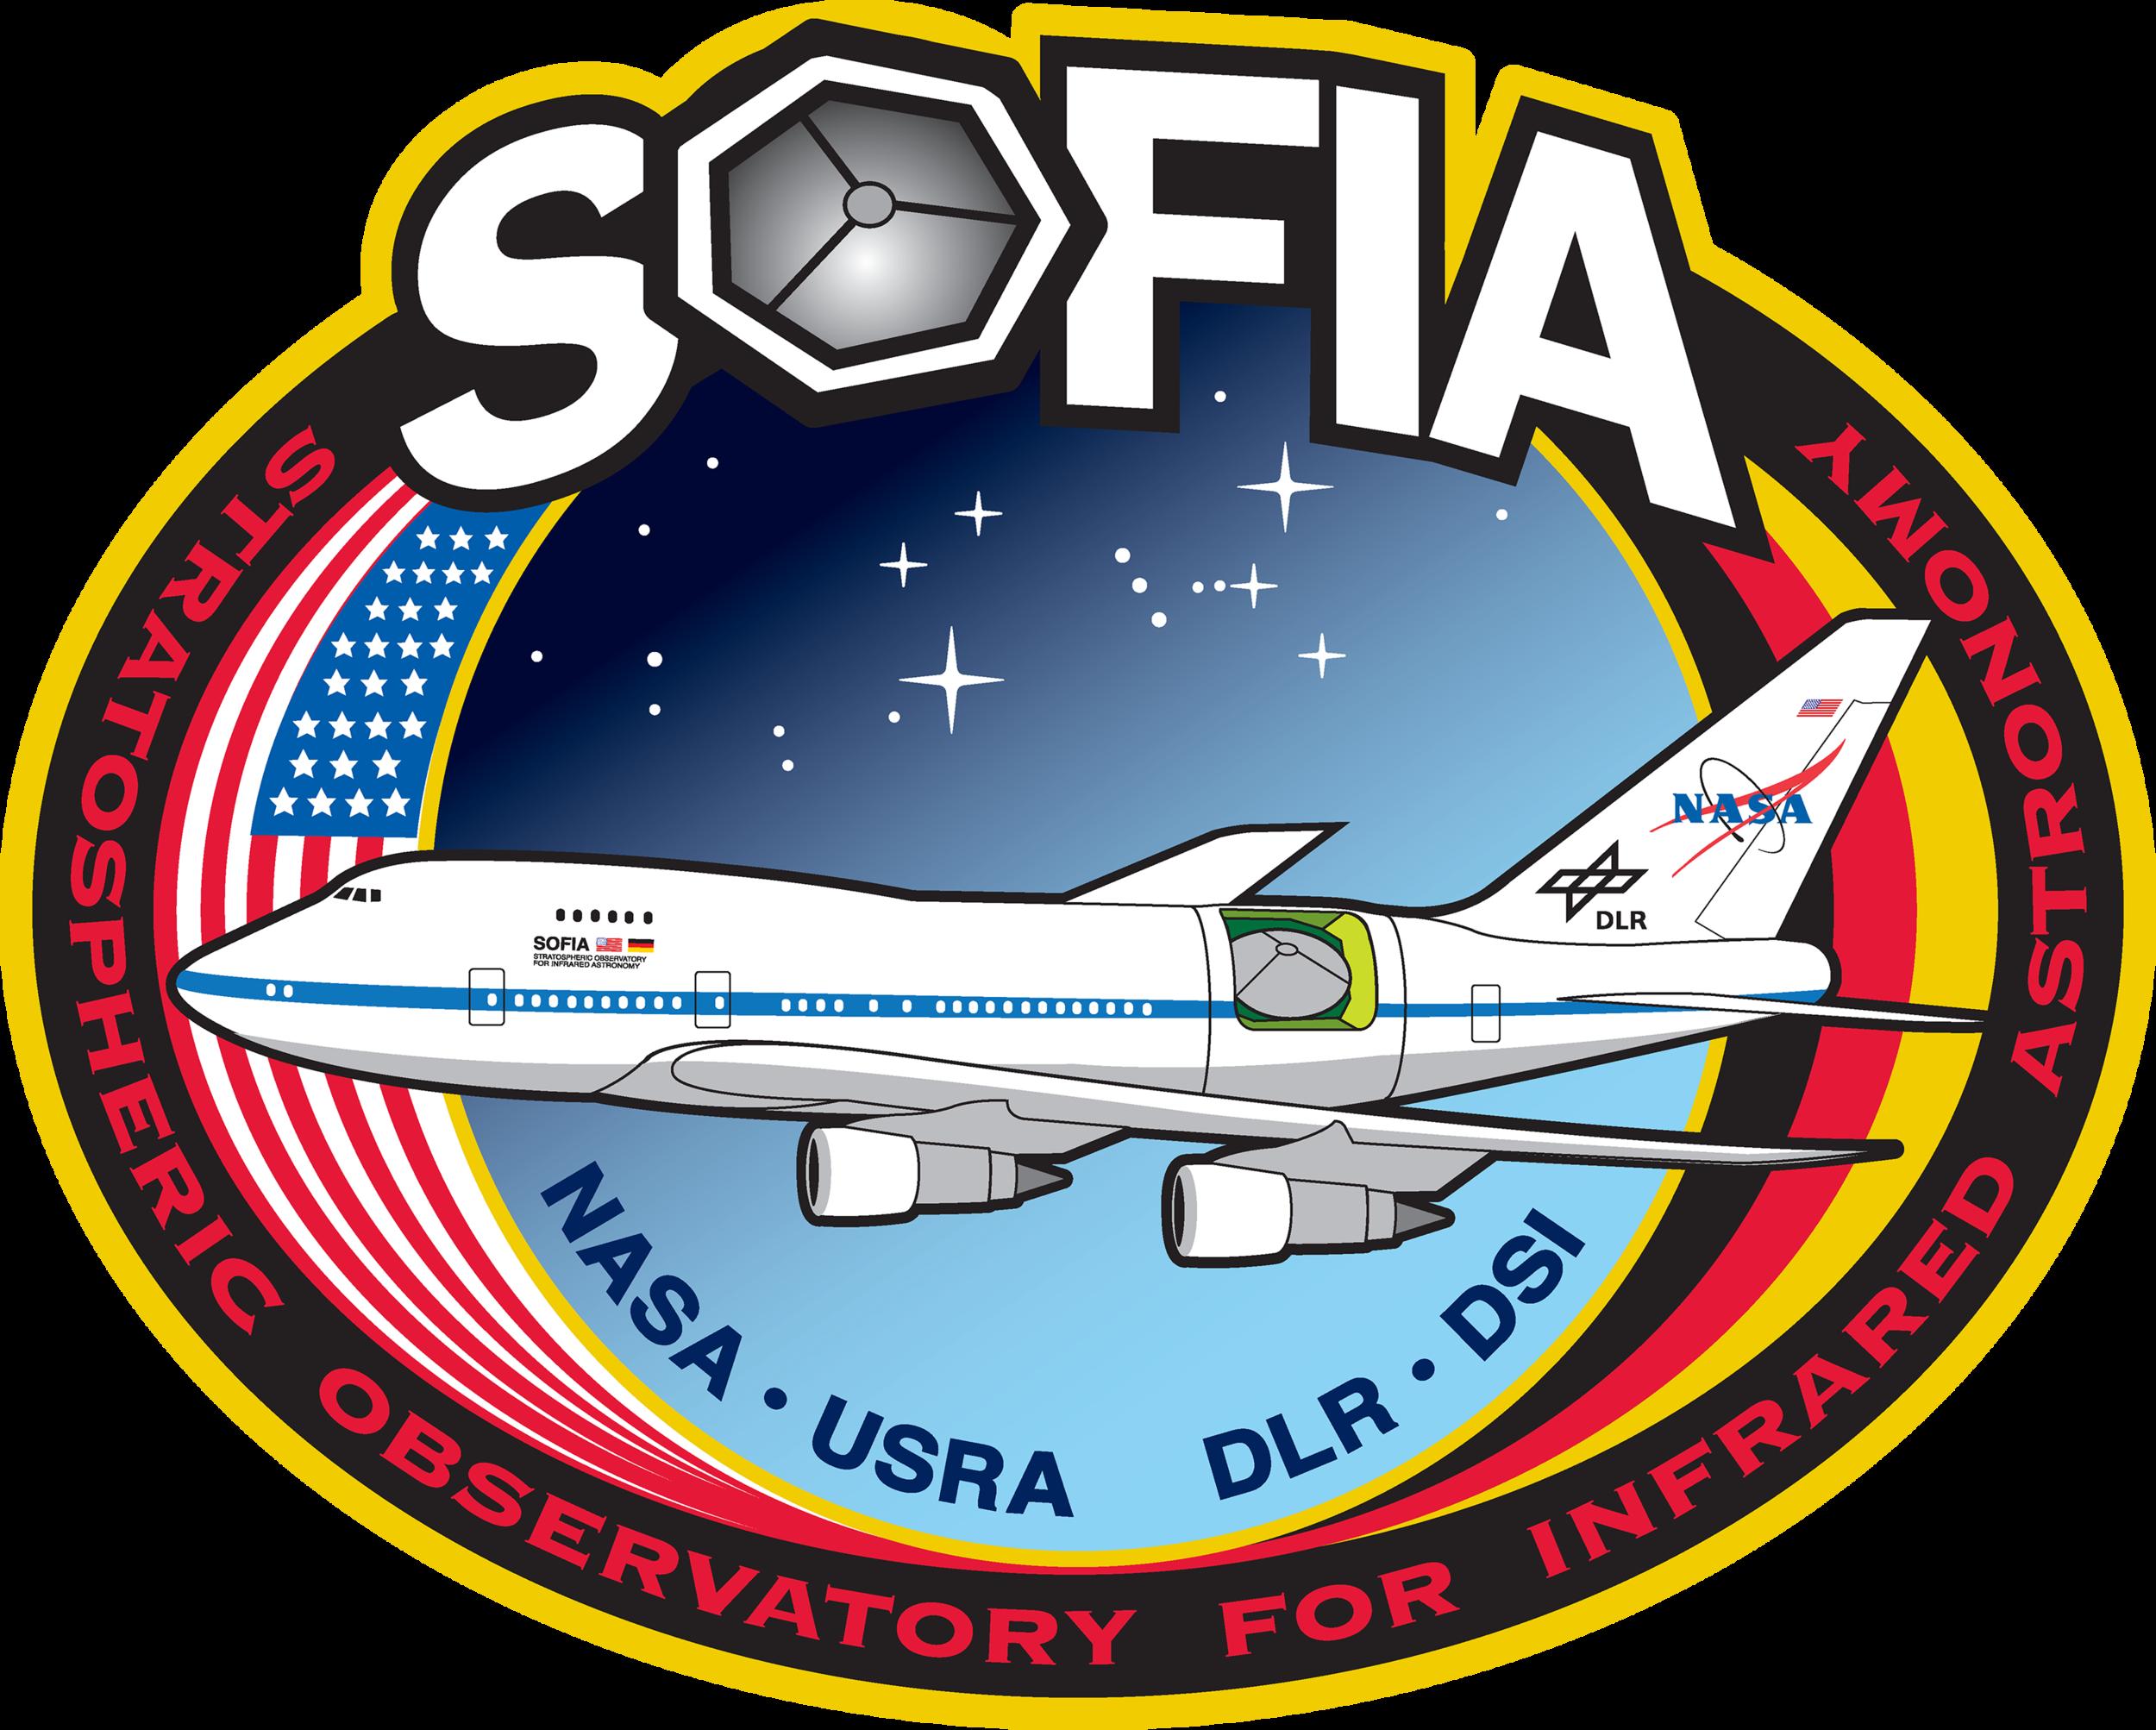 SOFIA_sticker-FINAL_0.png